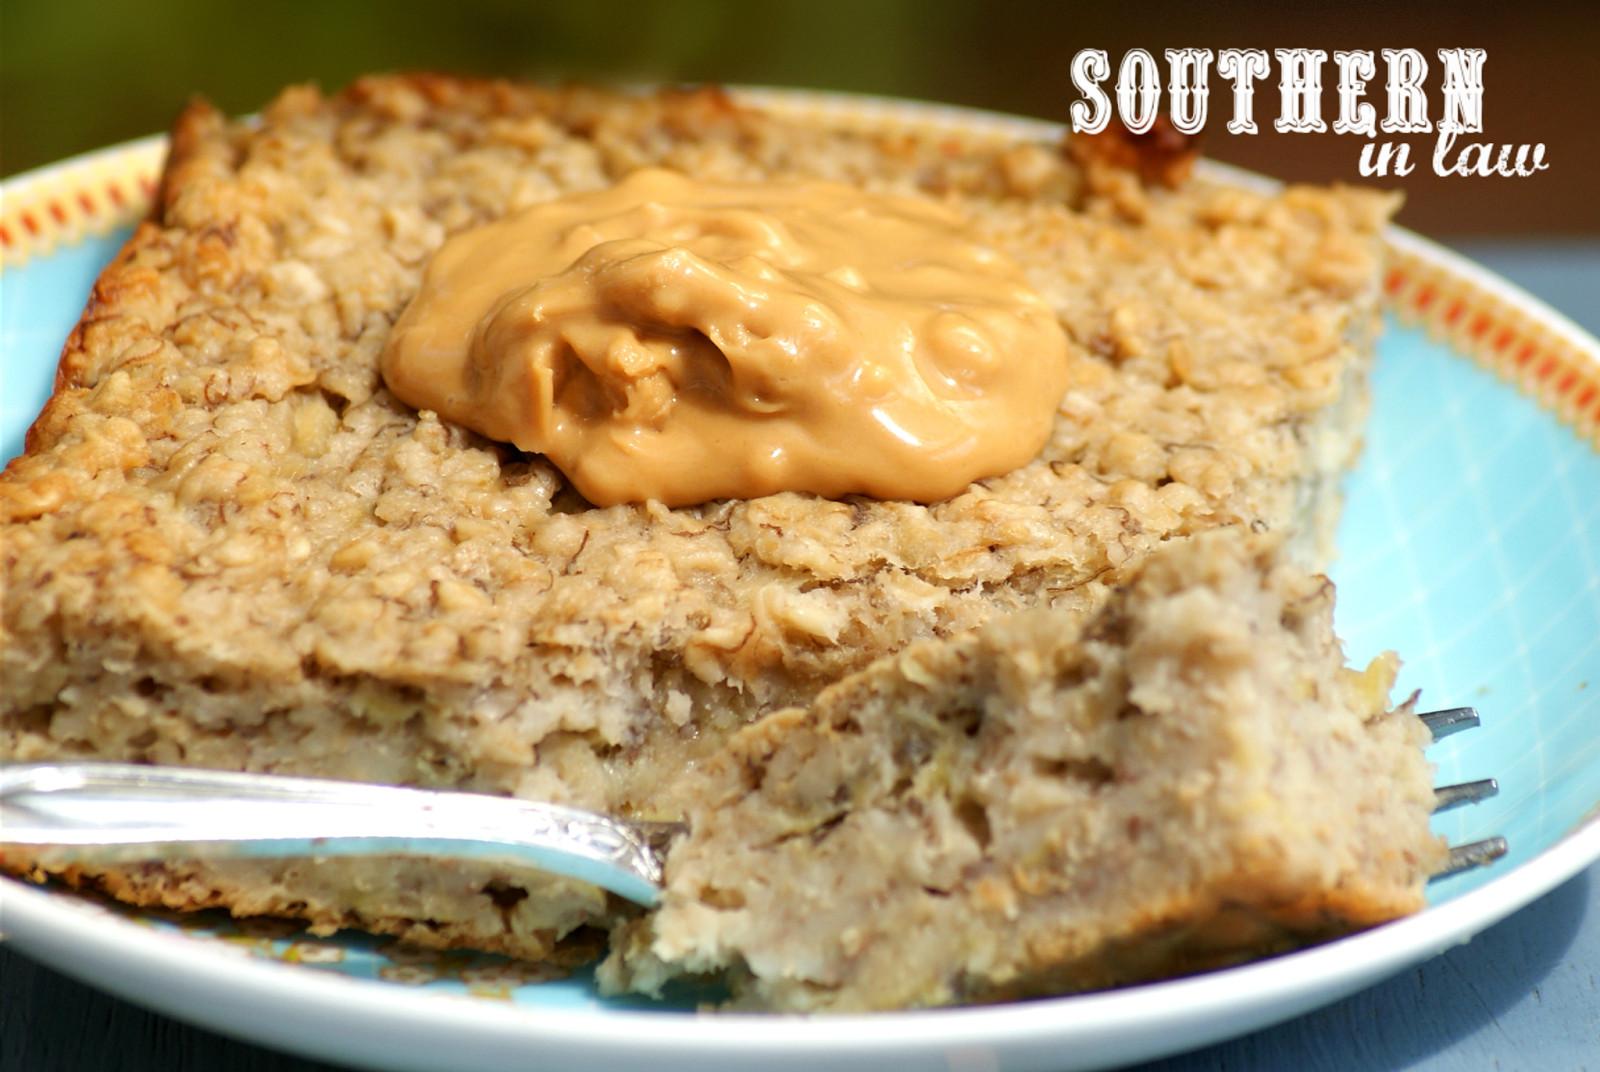 Healthy Oatmeal Bread Recipe  Southern In Law Recipe Banana Bread Baked Oatmeal